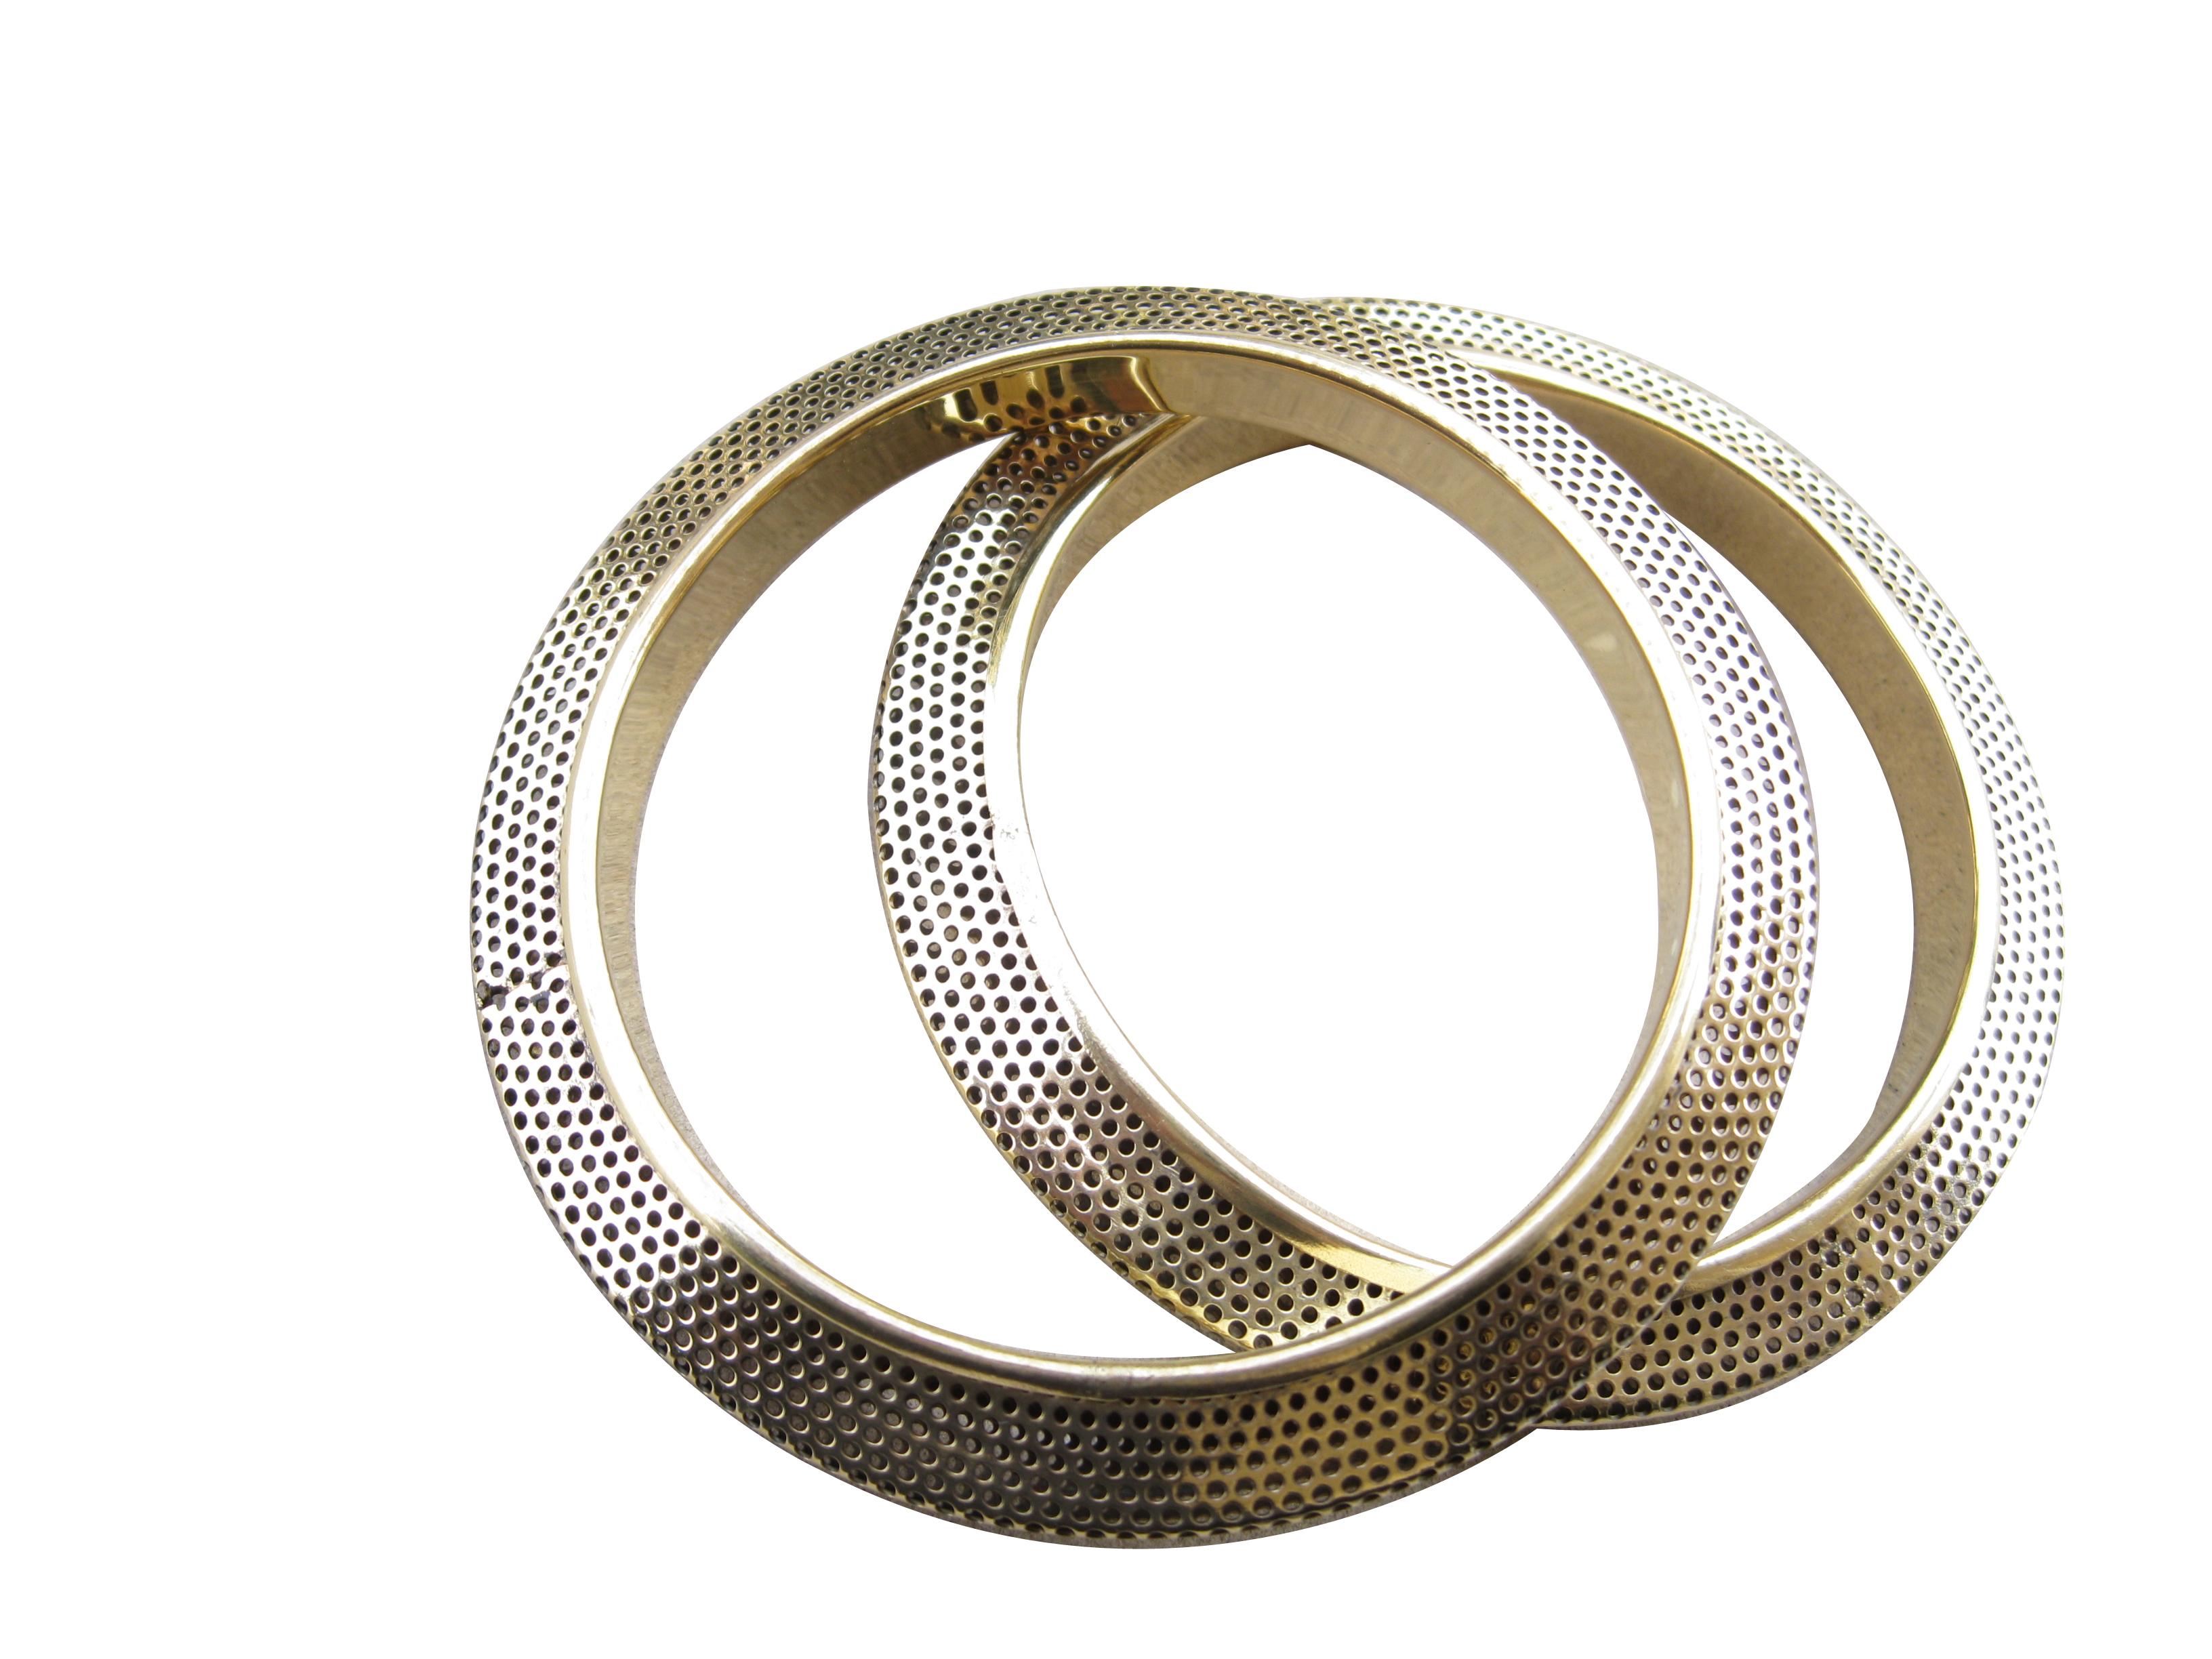 Jewelery & Bangles